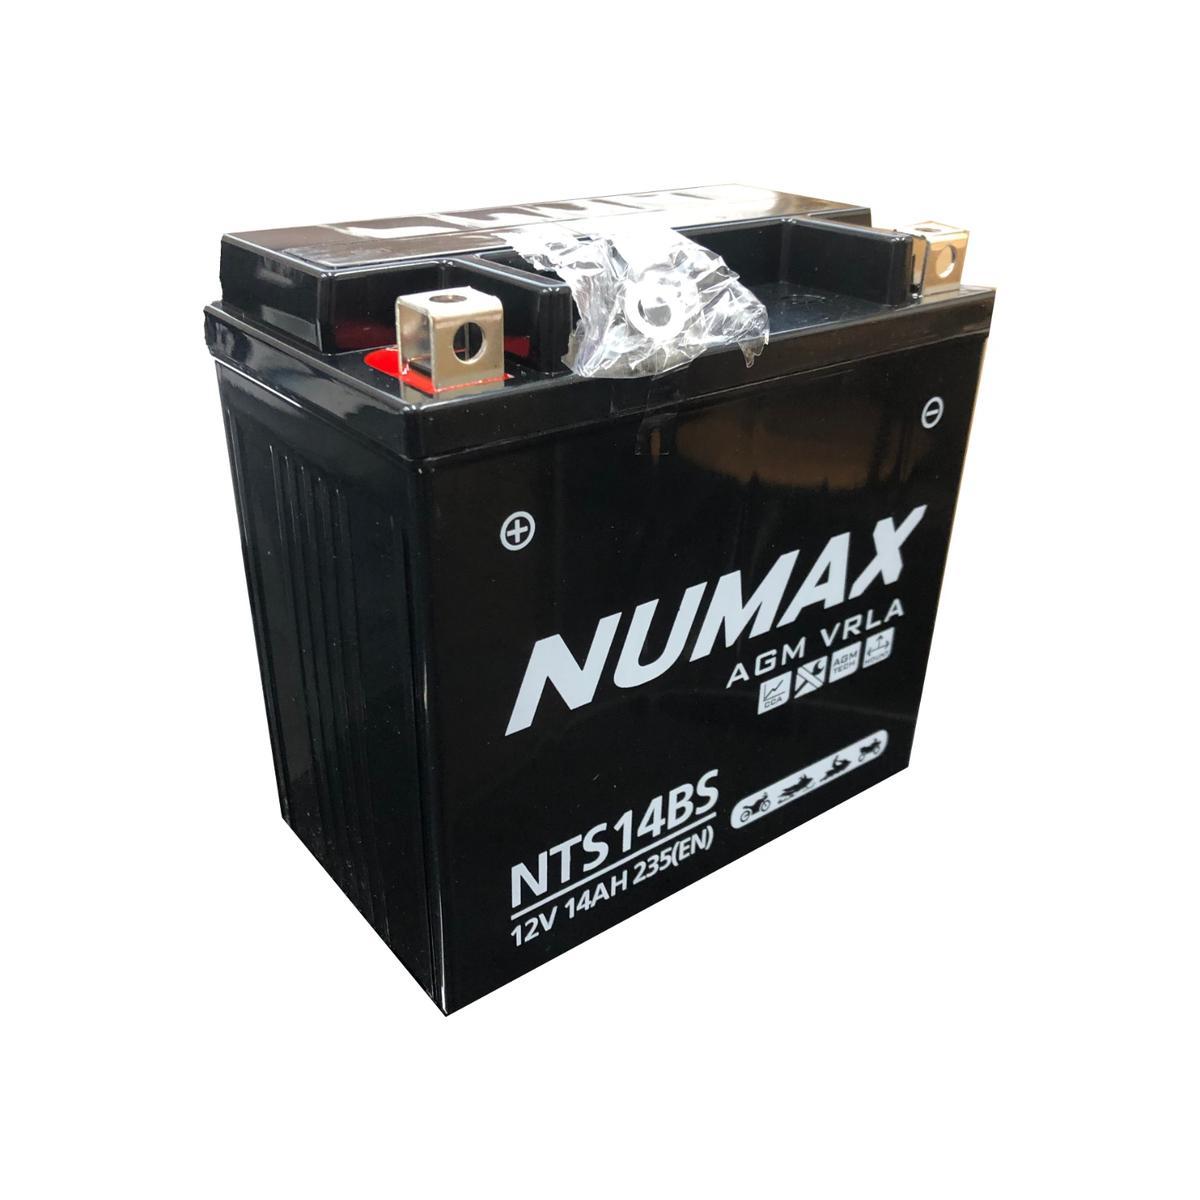 Numax NTS14BS 12v Motorbike Bike Battery KAWASAKI 1100cc GPZ1100 E2 YTX14-4